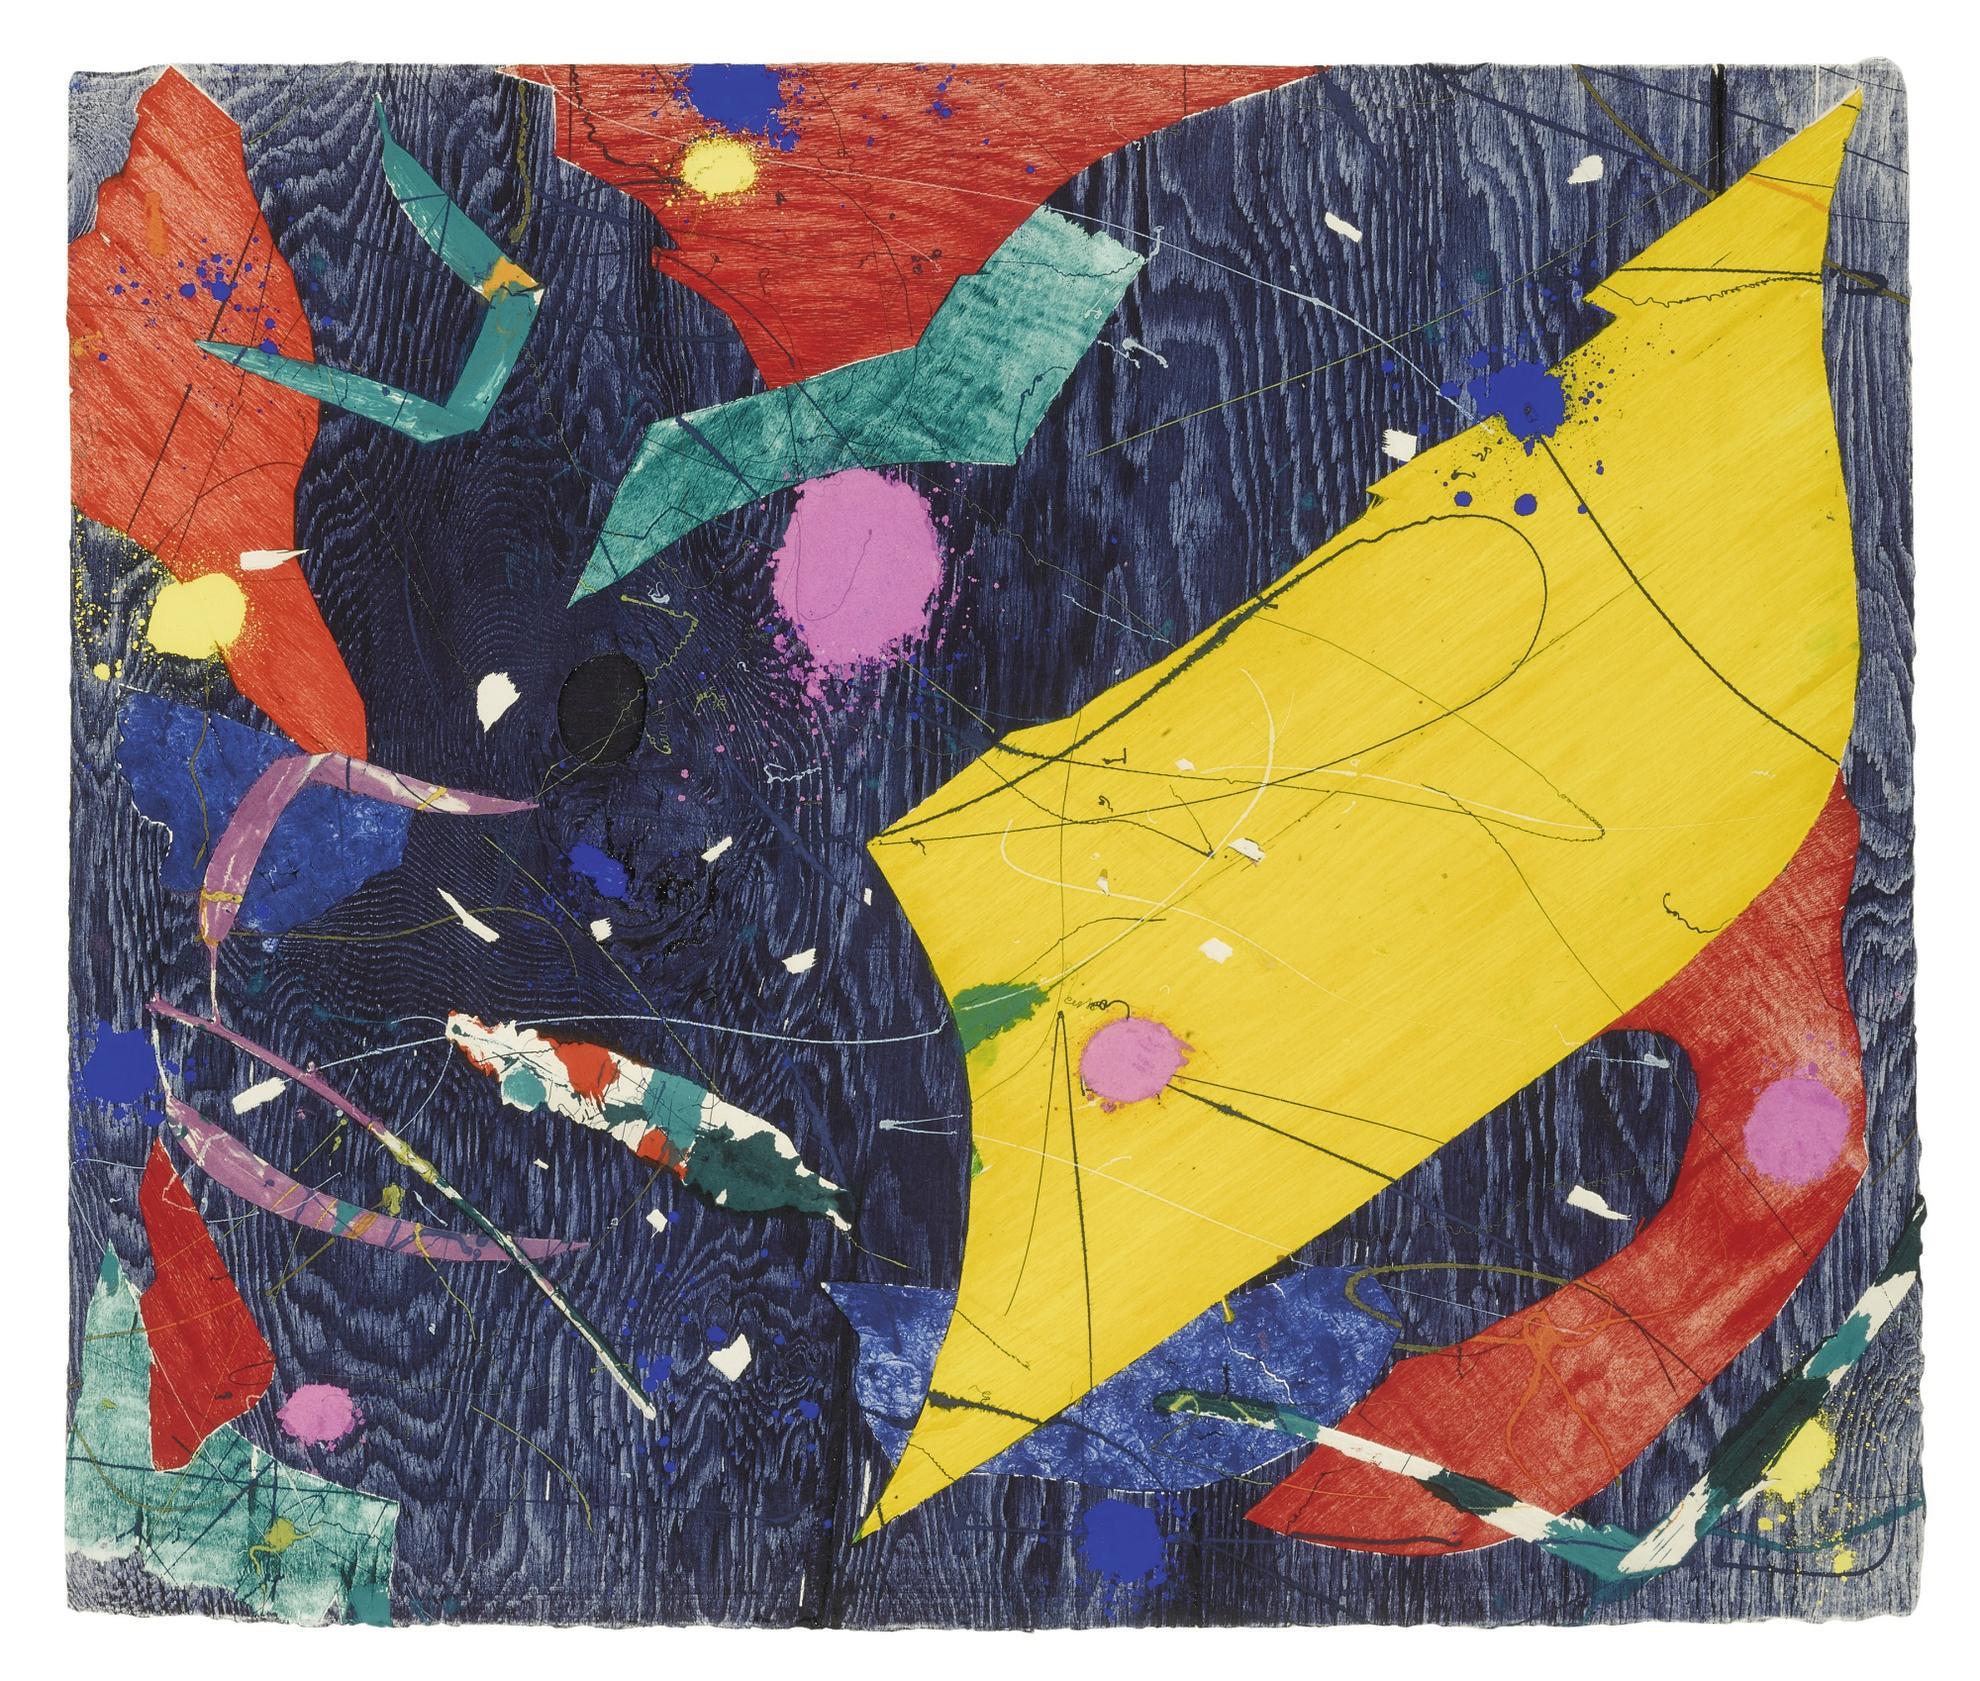 Sam Francis-Untitled (Sfm 84-523)-1984